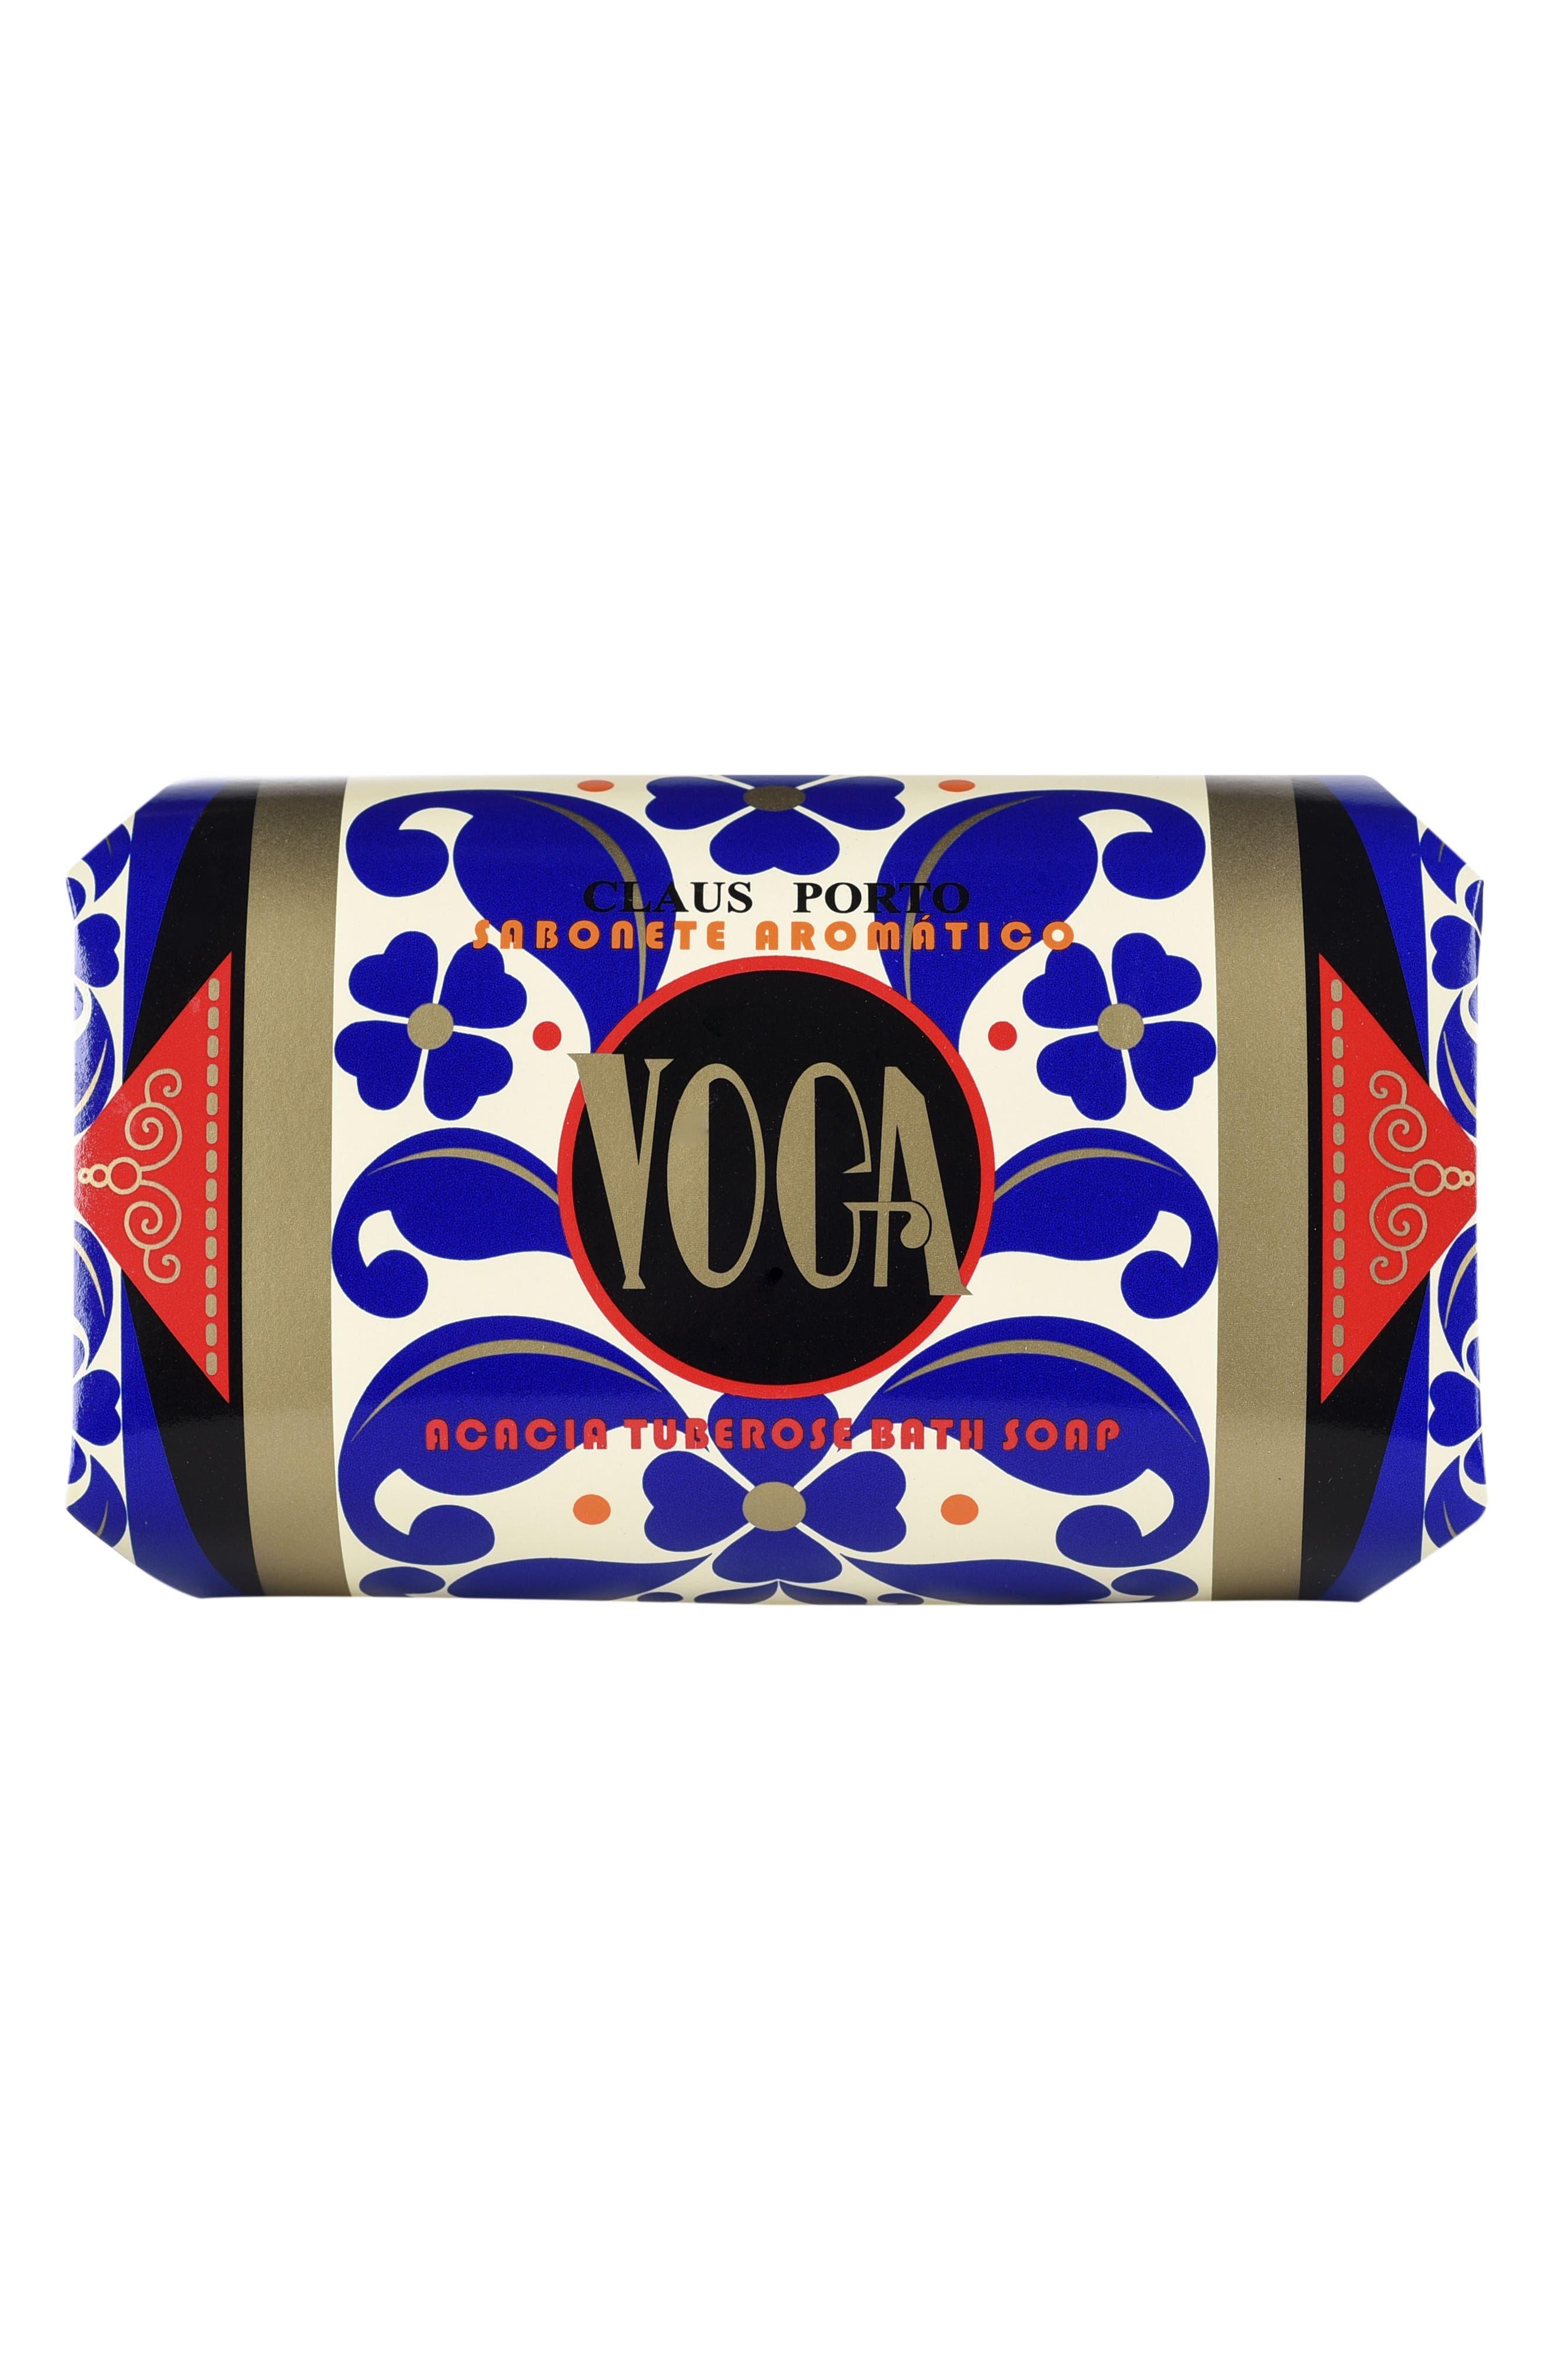 Voga Acacia Tuberose Large Bath Soap,                             Alternate thumbnail 2, color,                             NO COLOR